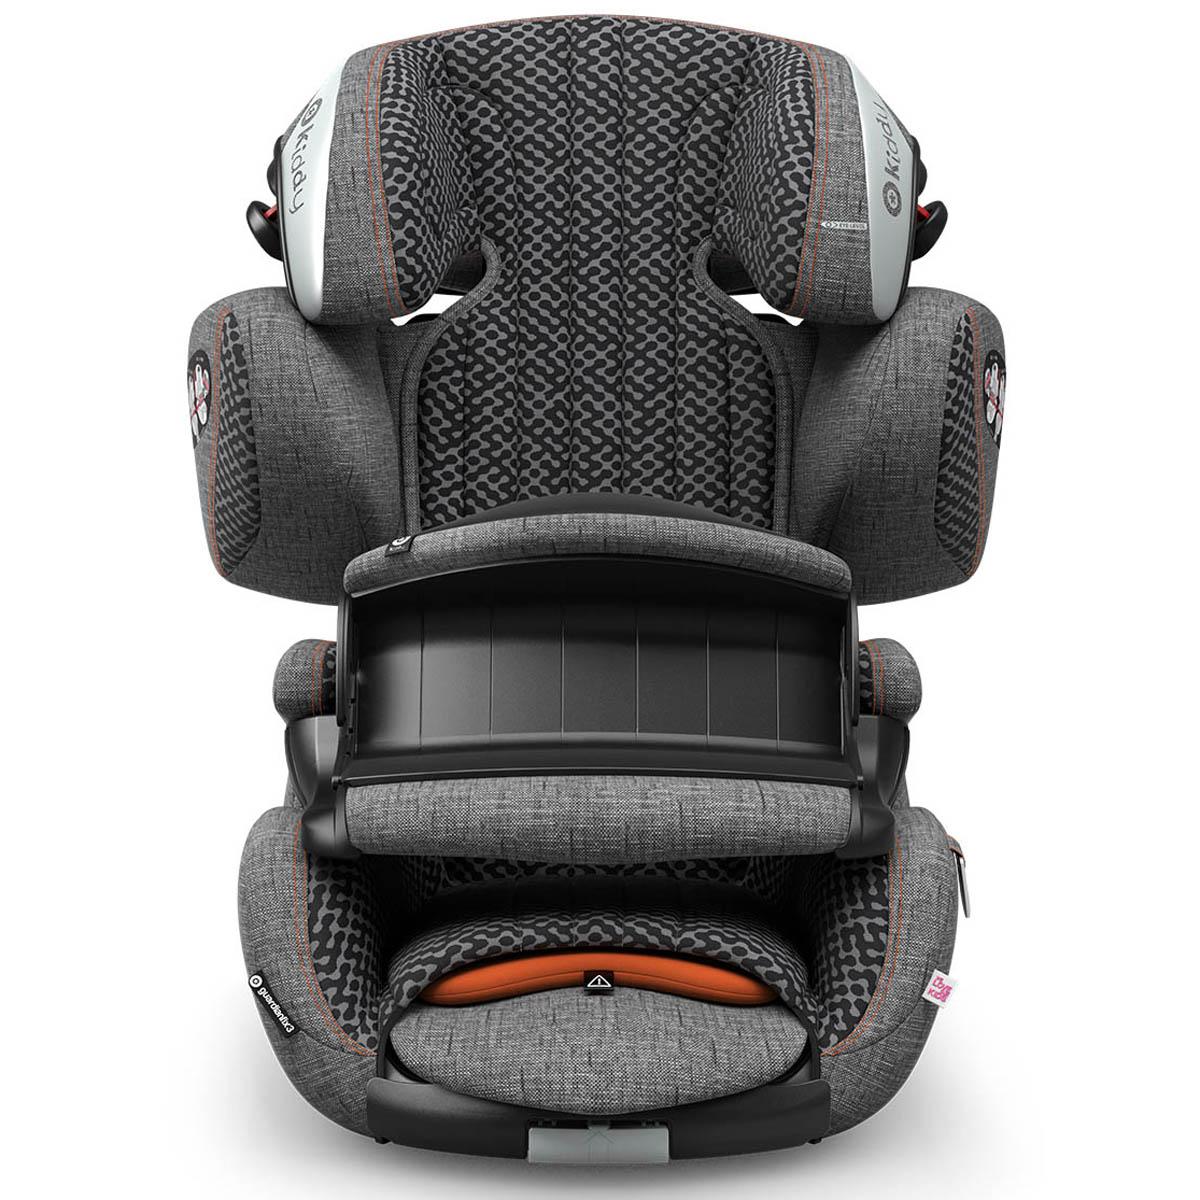 auto kindersitz kiddy guardianfix 3 retro charcoal. Black Bedroom Furniture Sets. Home Design Ideas